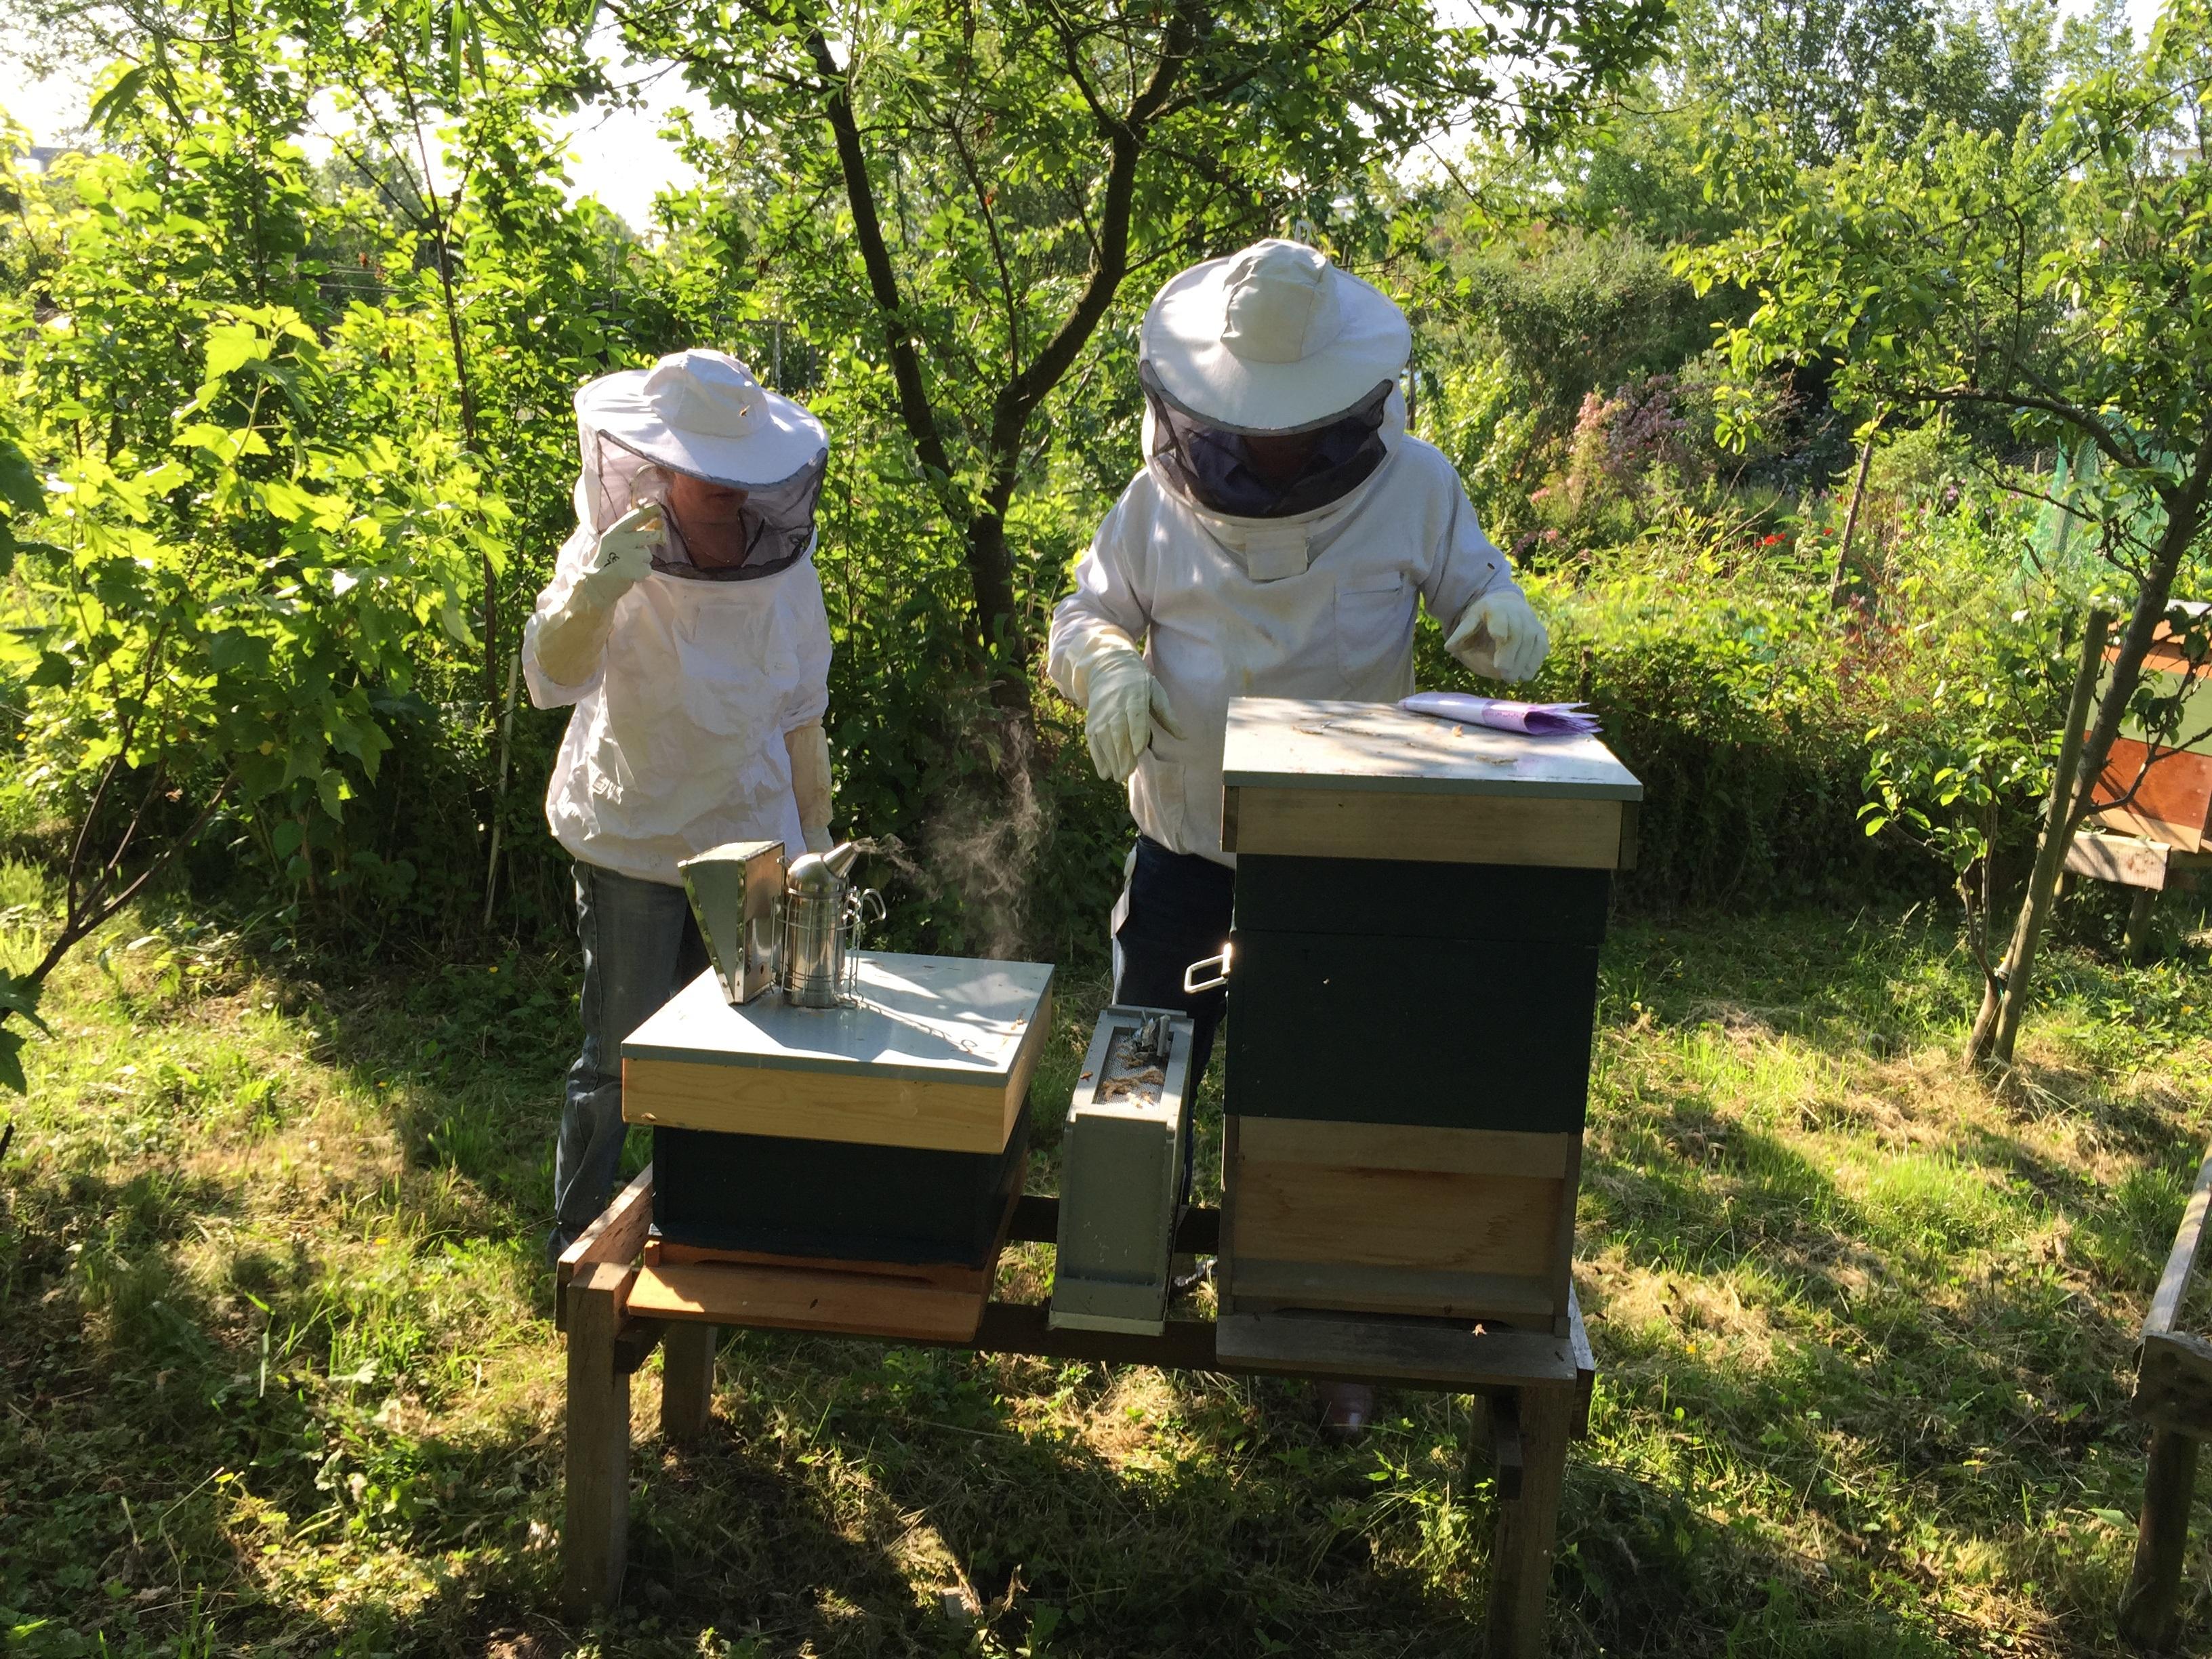 Fotos gratis : insecto, invertebrado, apicultor, colmena, abeja ...